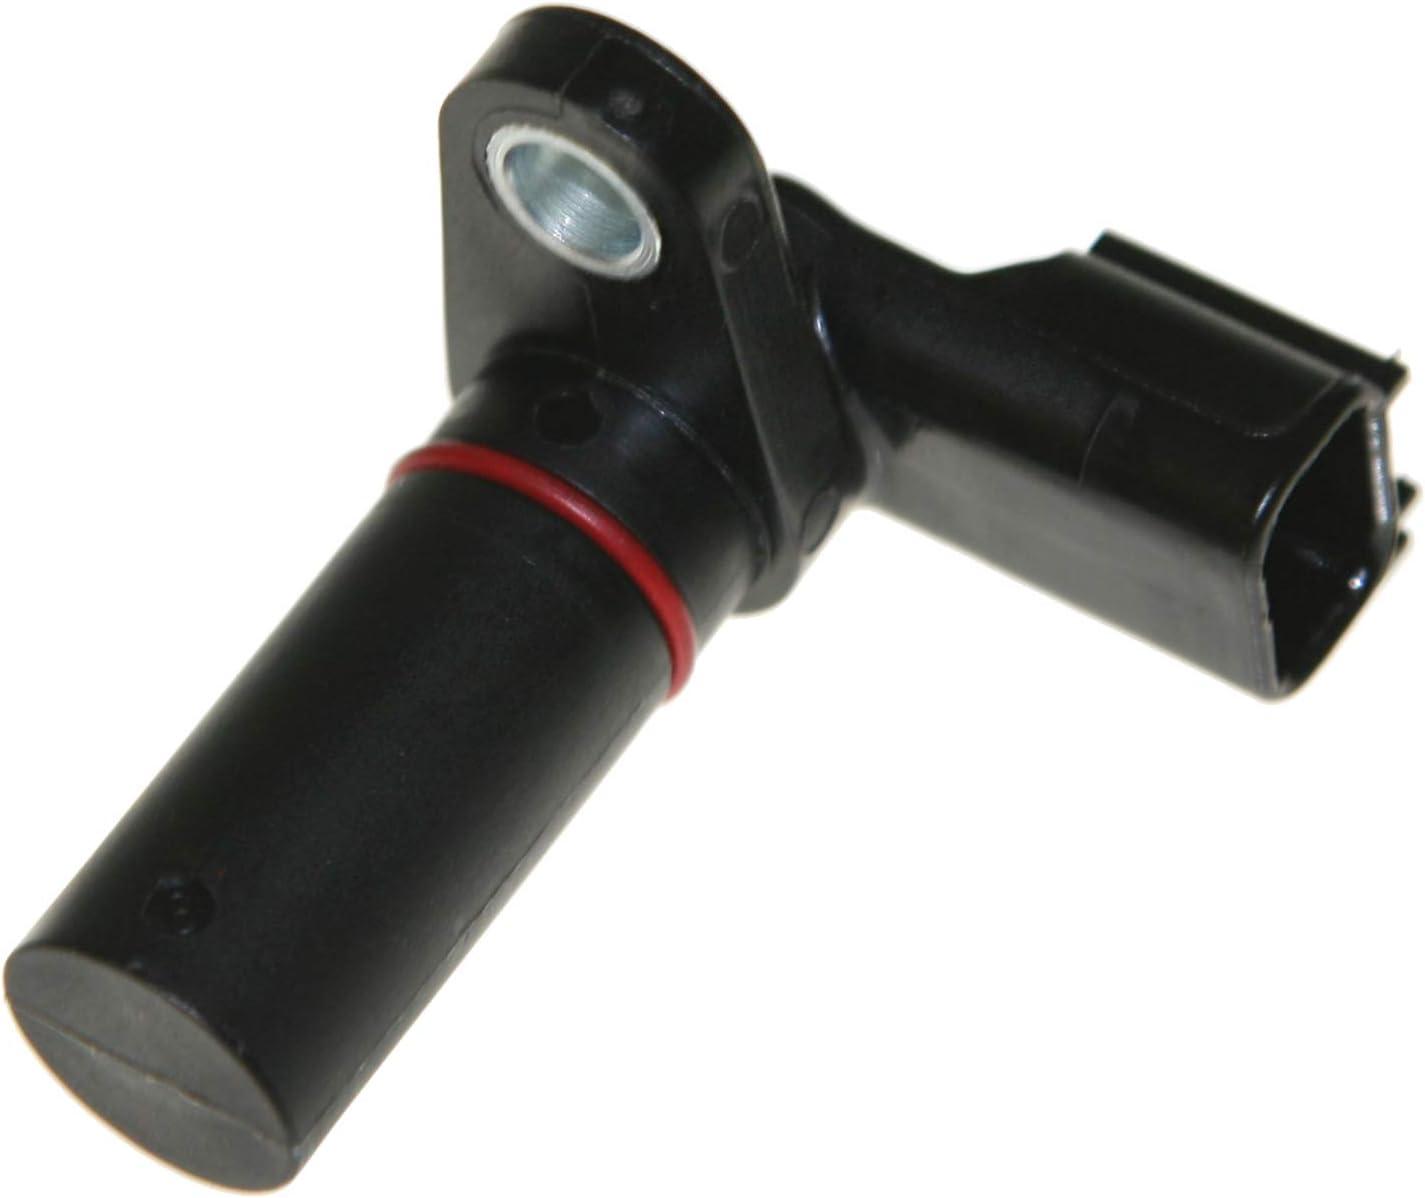 Crankshaft Position Sensor Compatible with FORD EDGE EXPLORER F-150 F150 FLEX FUSION MUSTANG TAURUS TAURUS X TRANSIT-150//250//350 LINCOLN MKS MKT MKX MKZ MERCURY SABLE